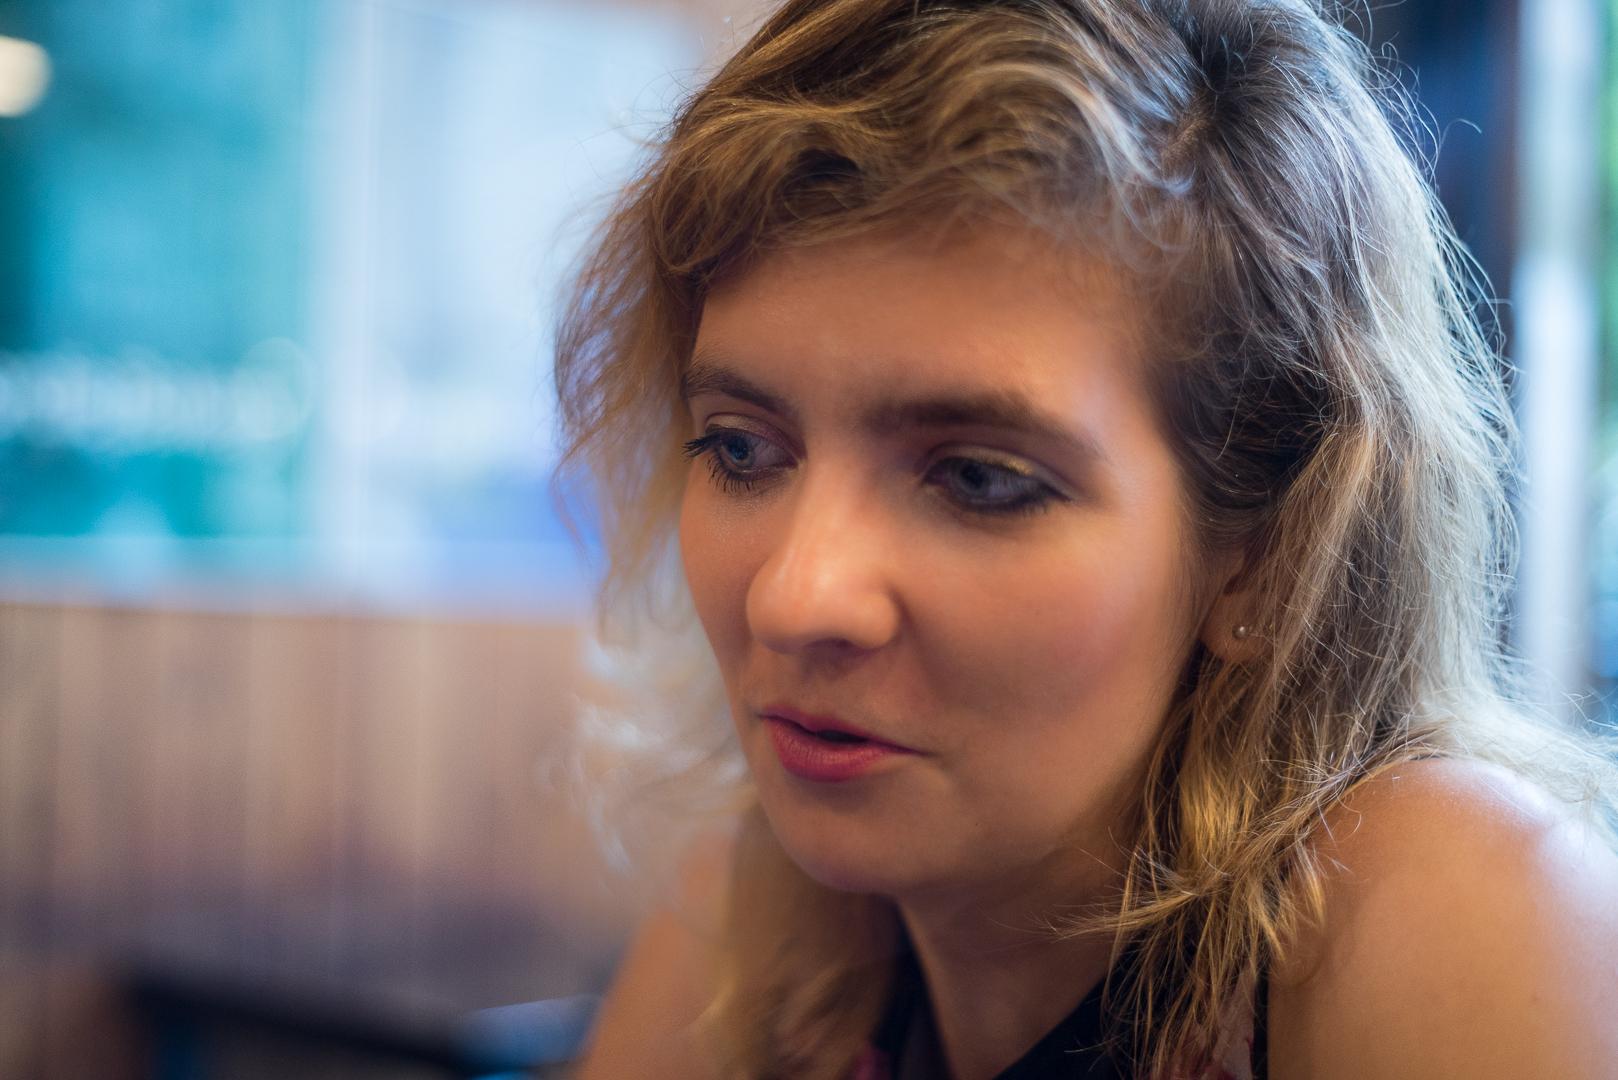 Justyna - 4 - 2017.jpg